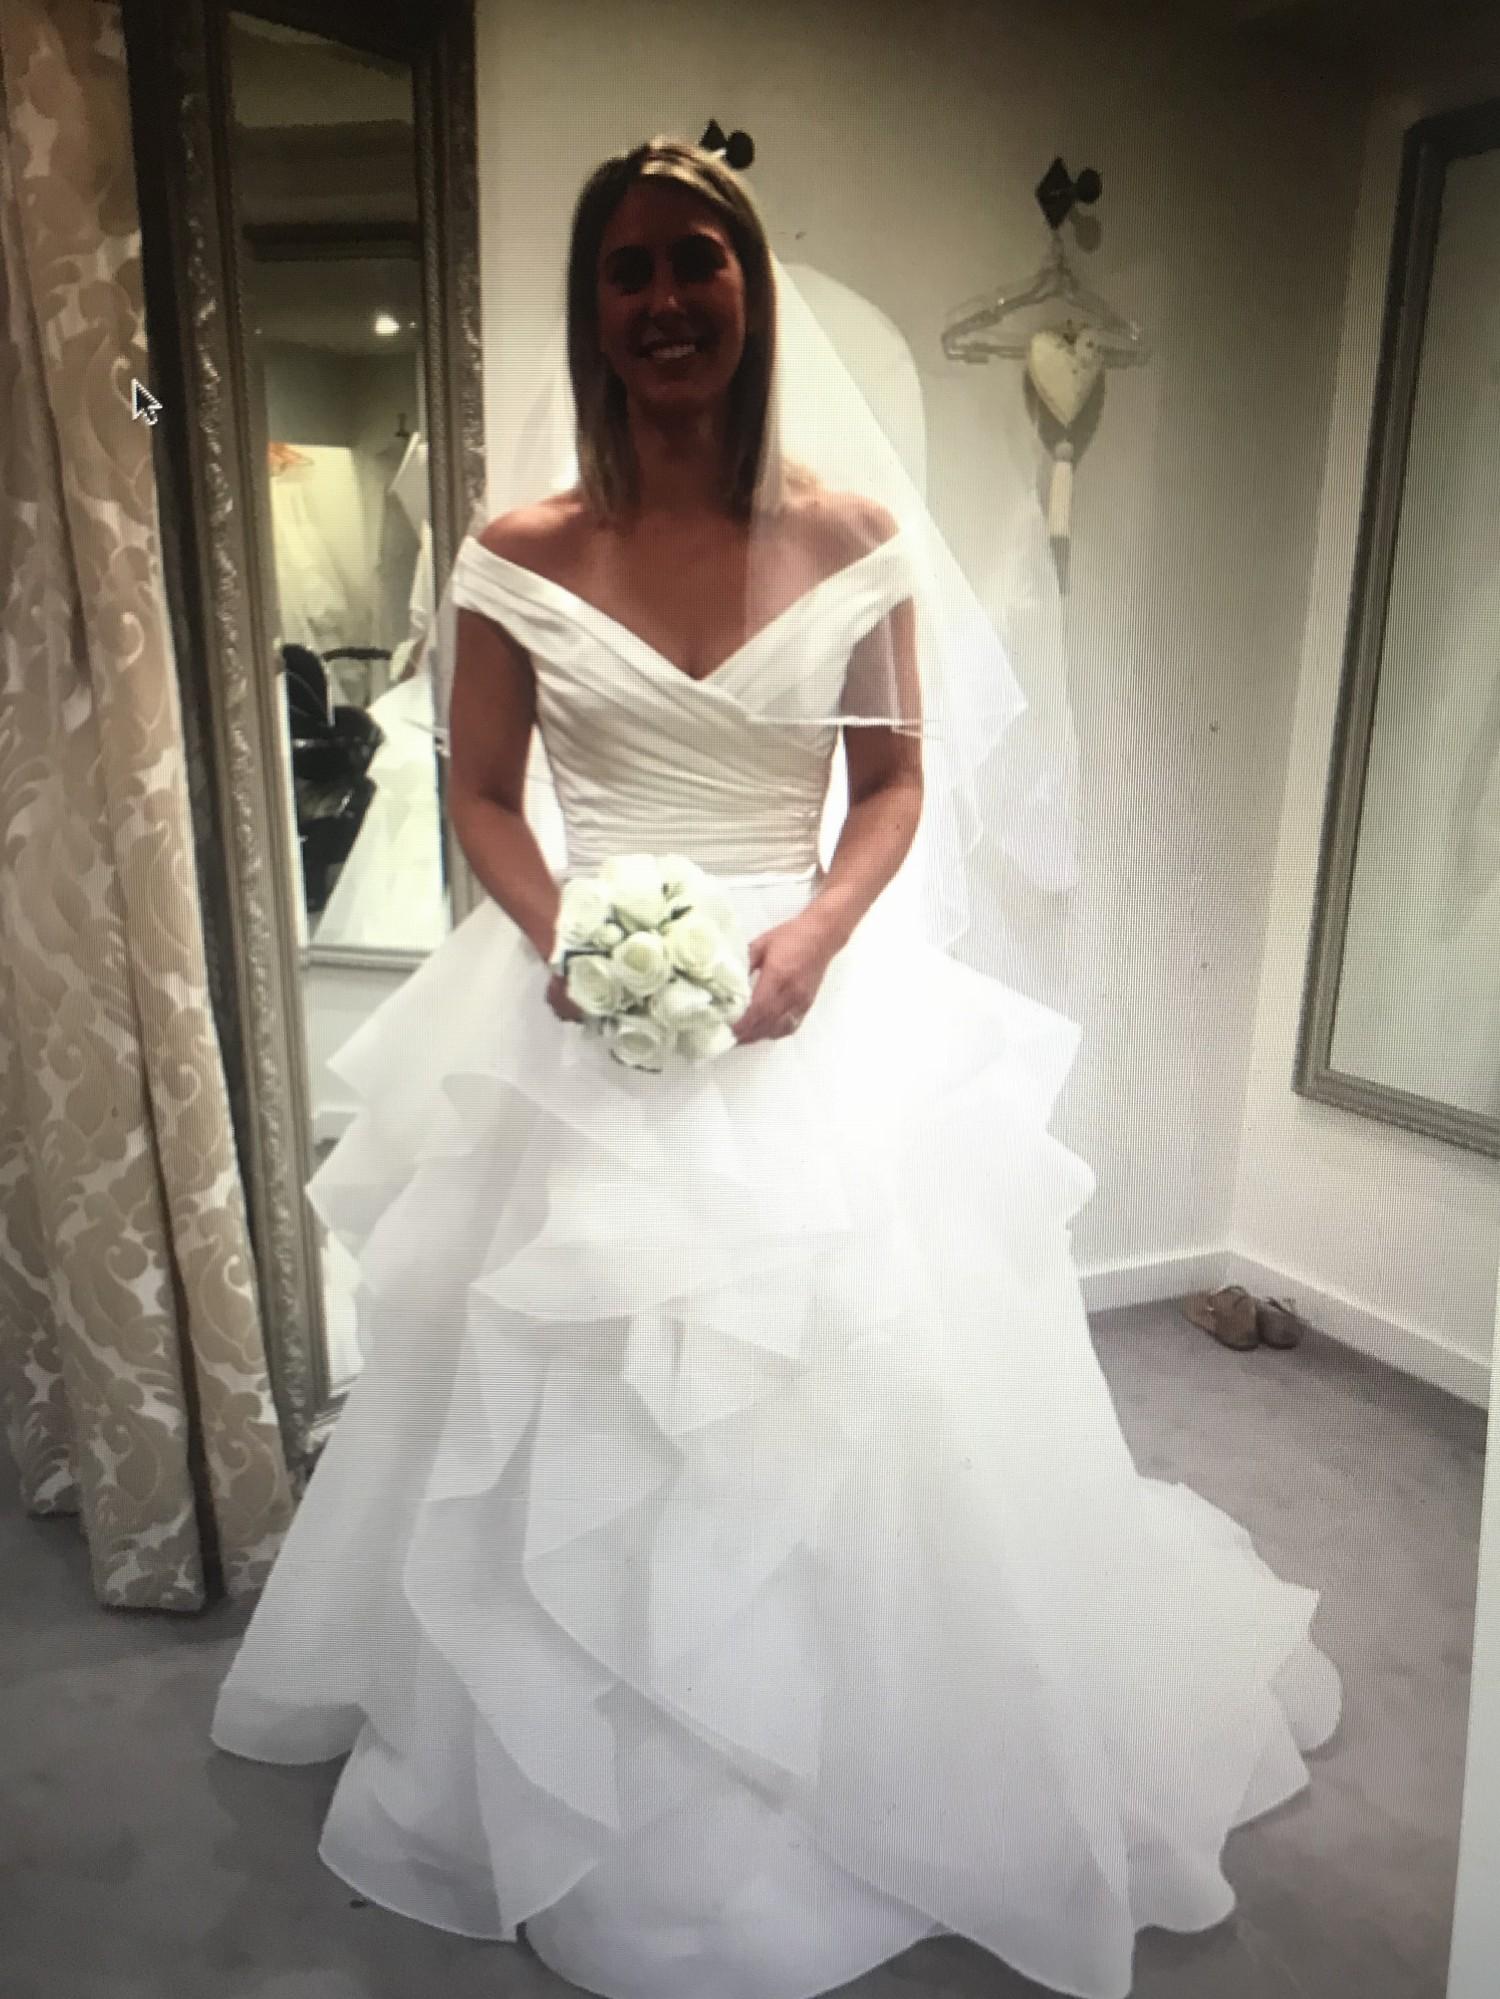 e5528ee3d59e Ball Gown New Wedding Dress on Sale - Stillwhite United Kingdom